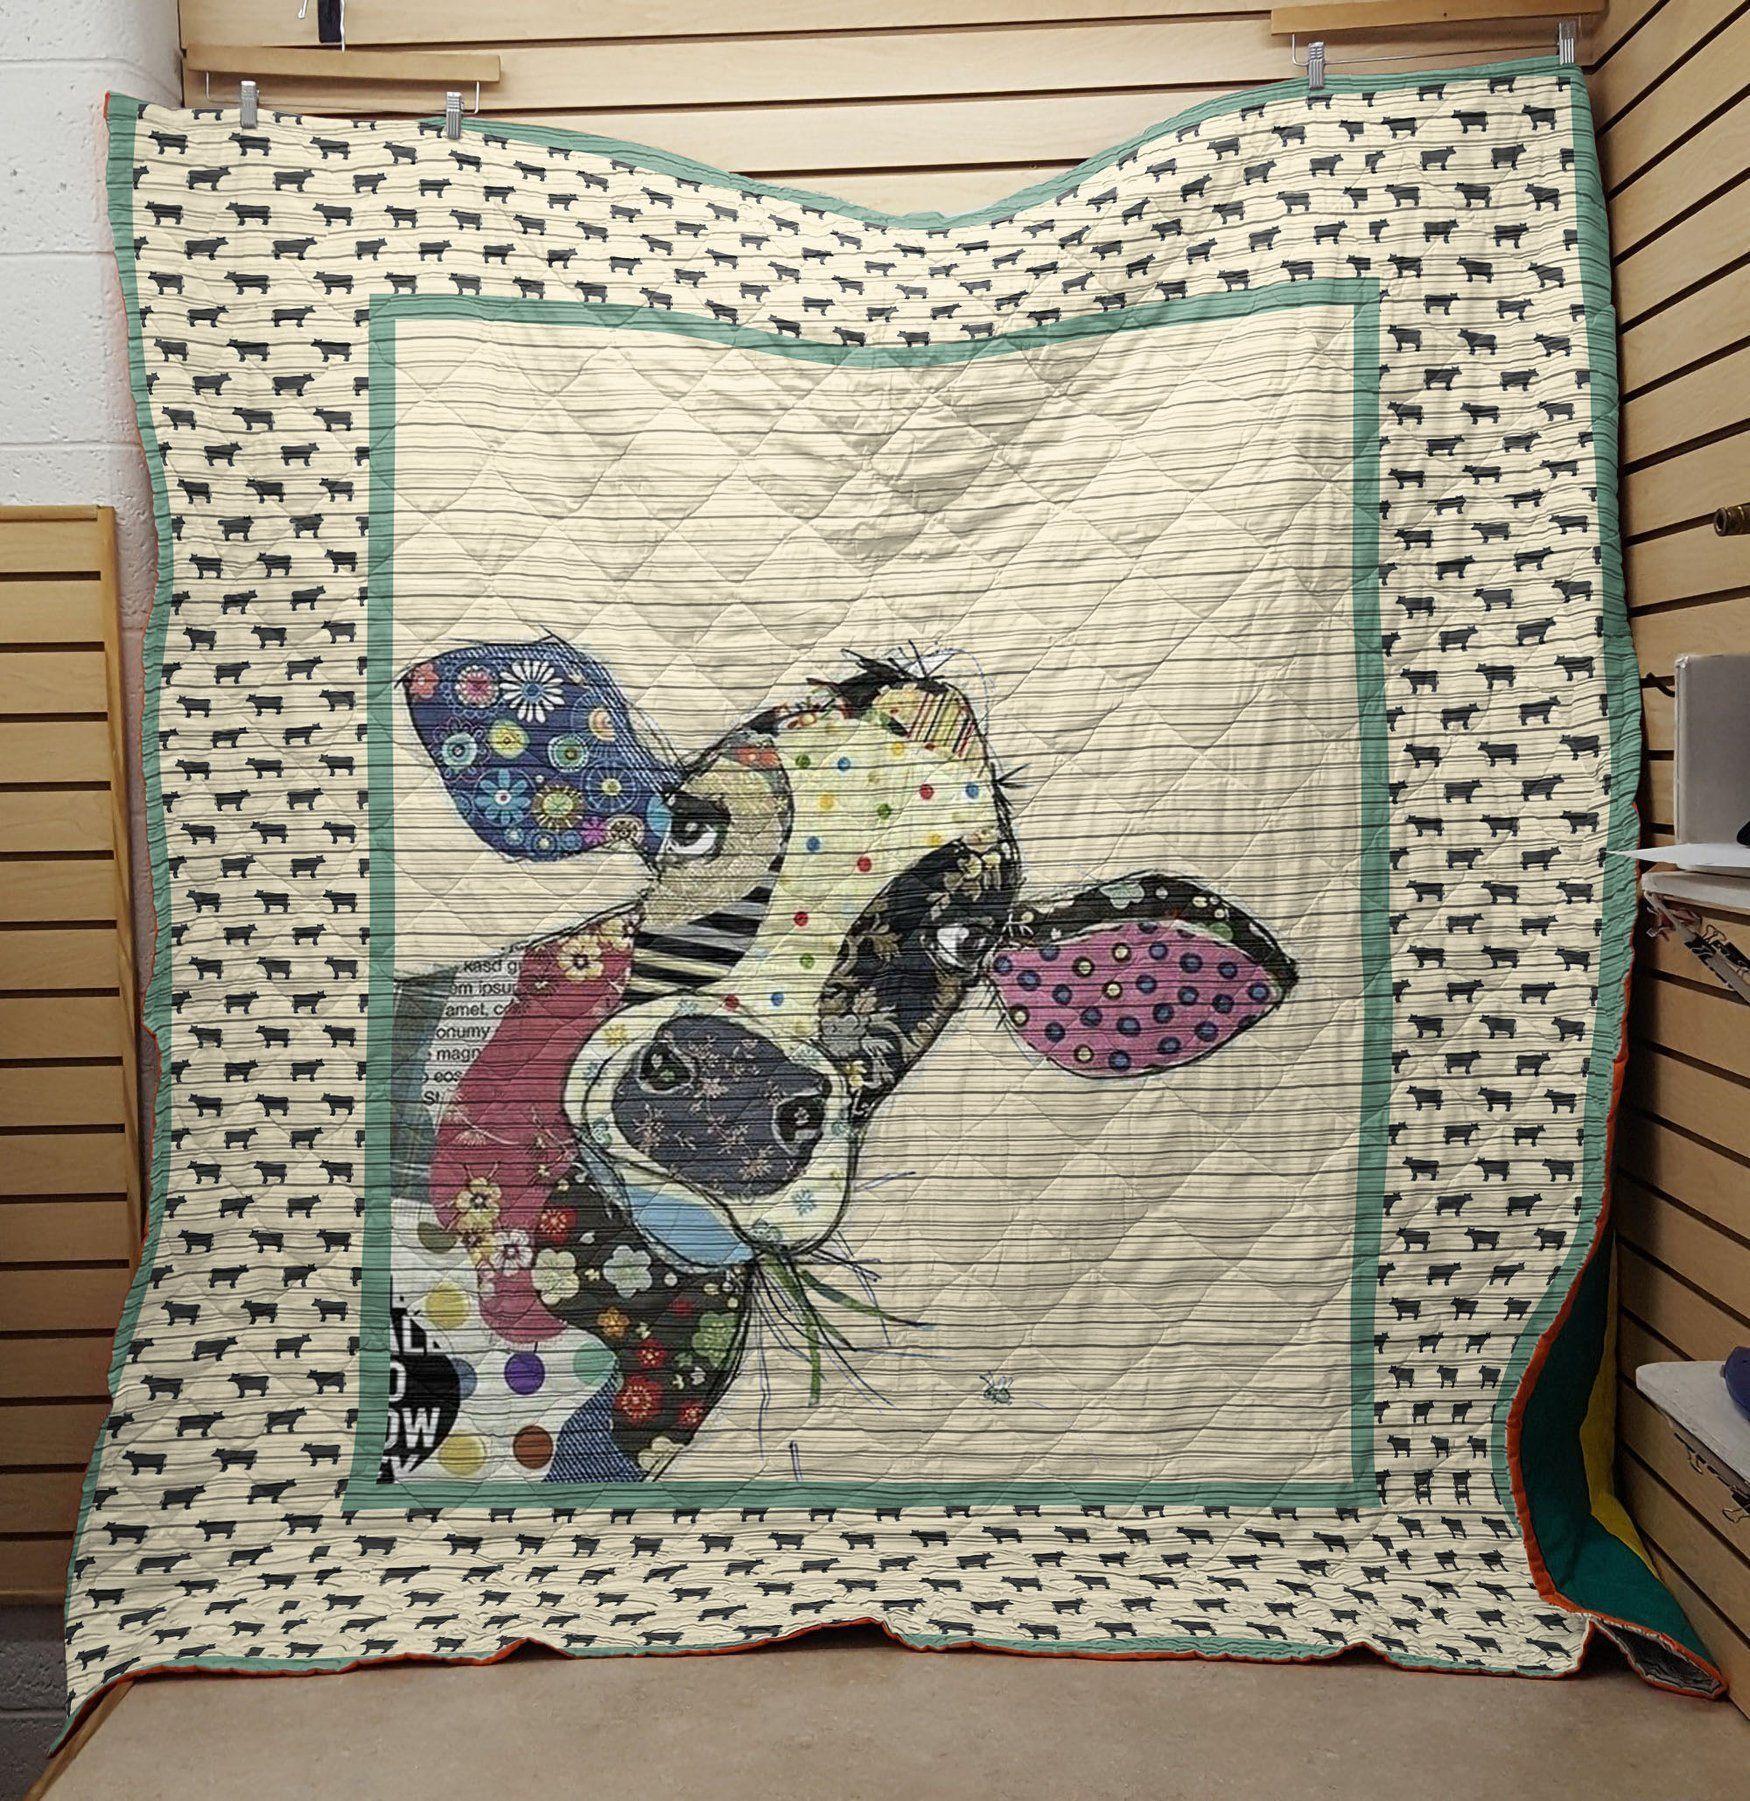 Cow fabric blanket - original